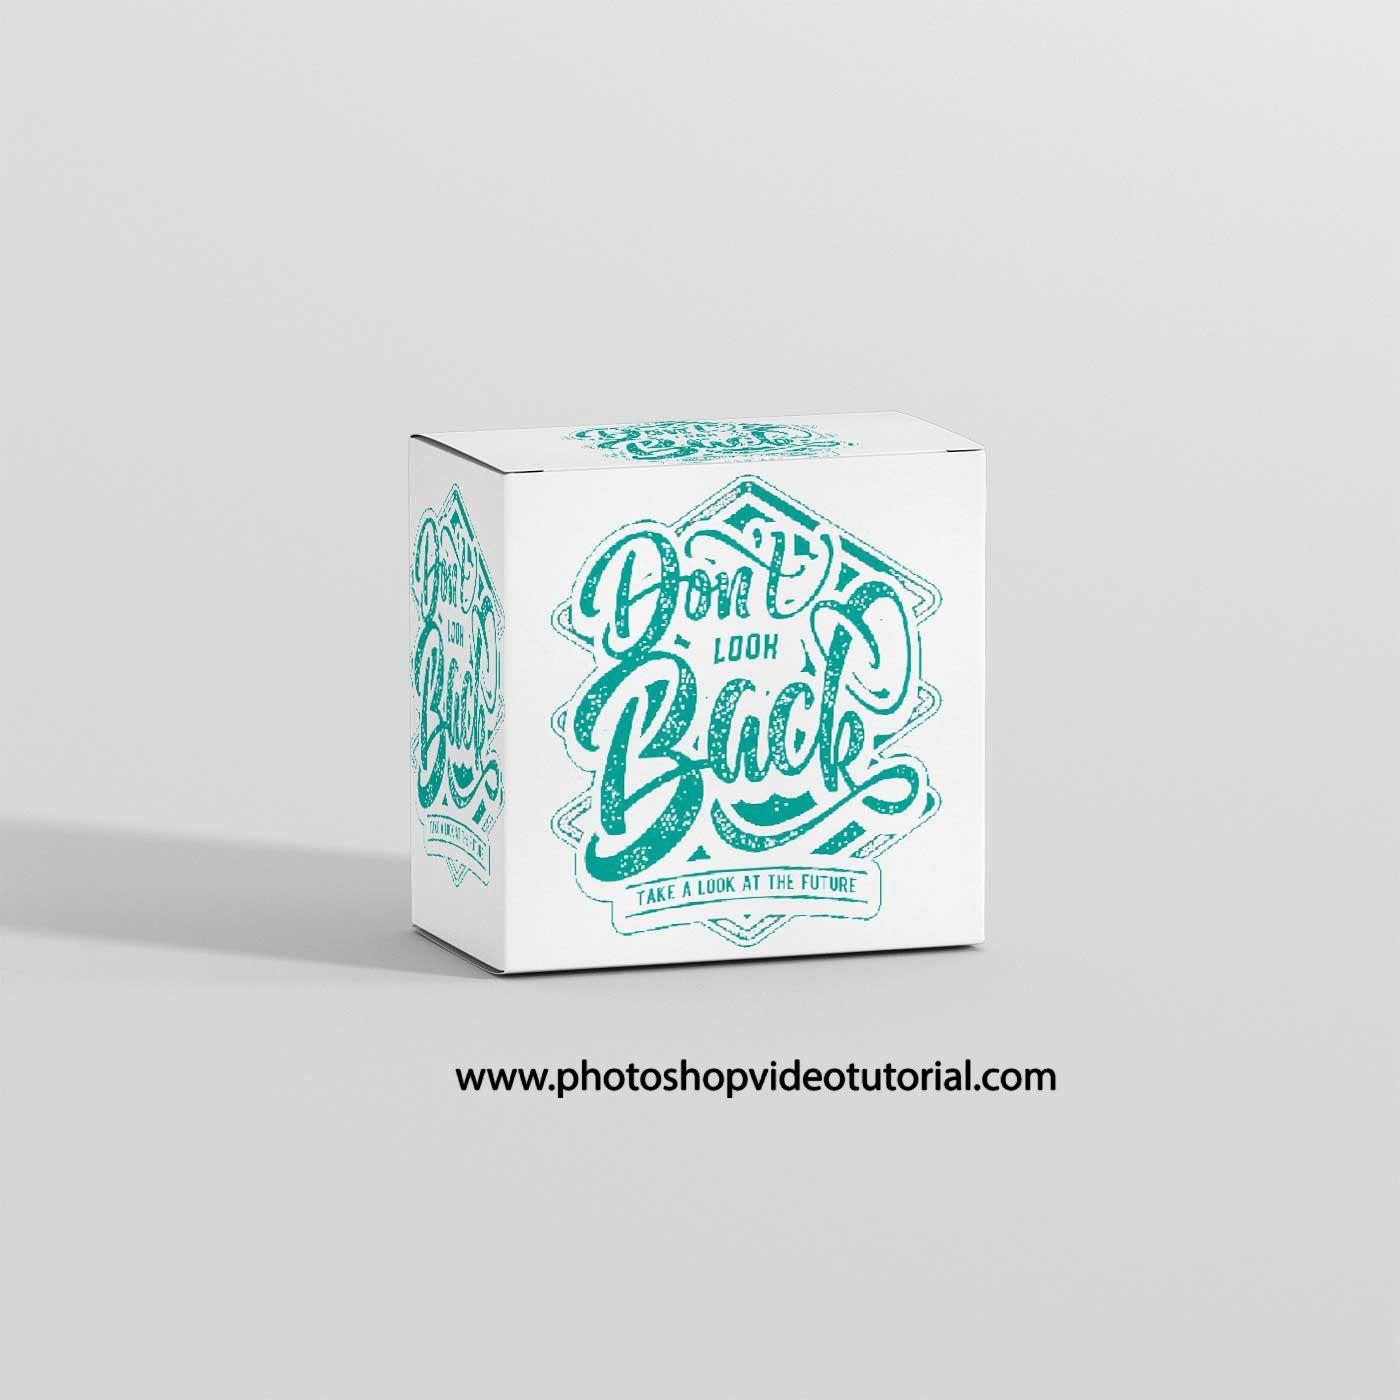 Download Free Download Box Mockups Psd Boxmockups Branding Download Downloadpsd Free Freemockup Freepsd Freebie Mo Mockup Free Psd Box Mockup Free Logo Mockup